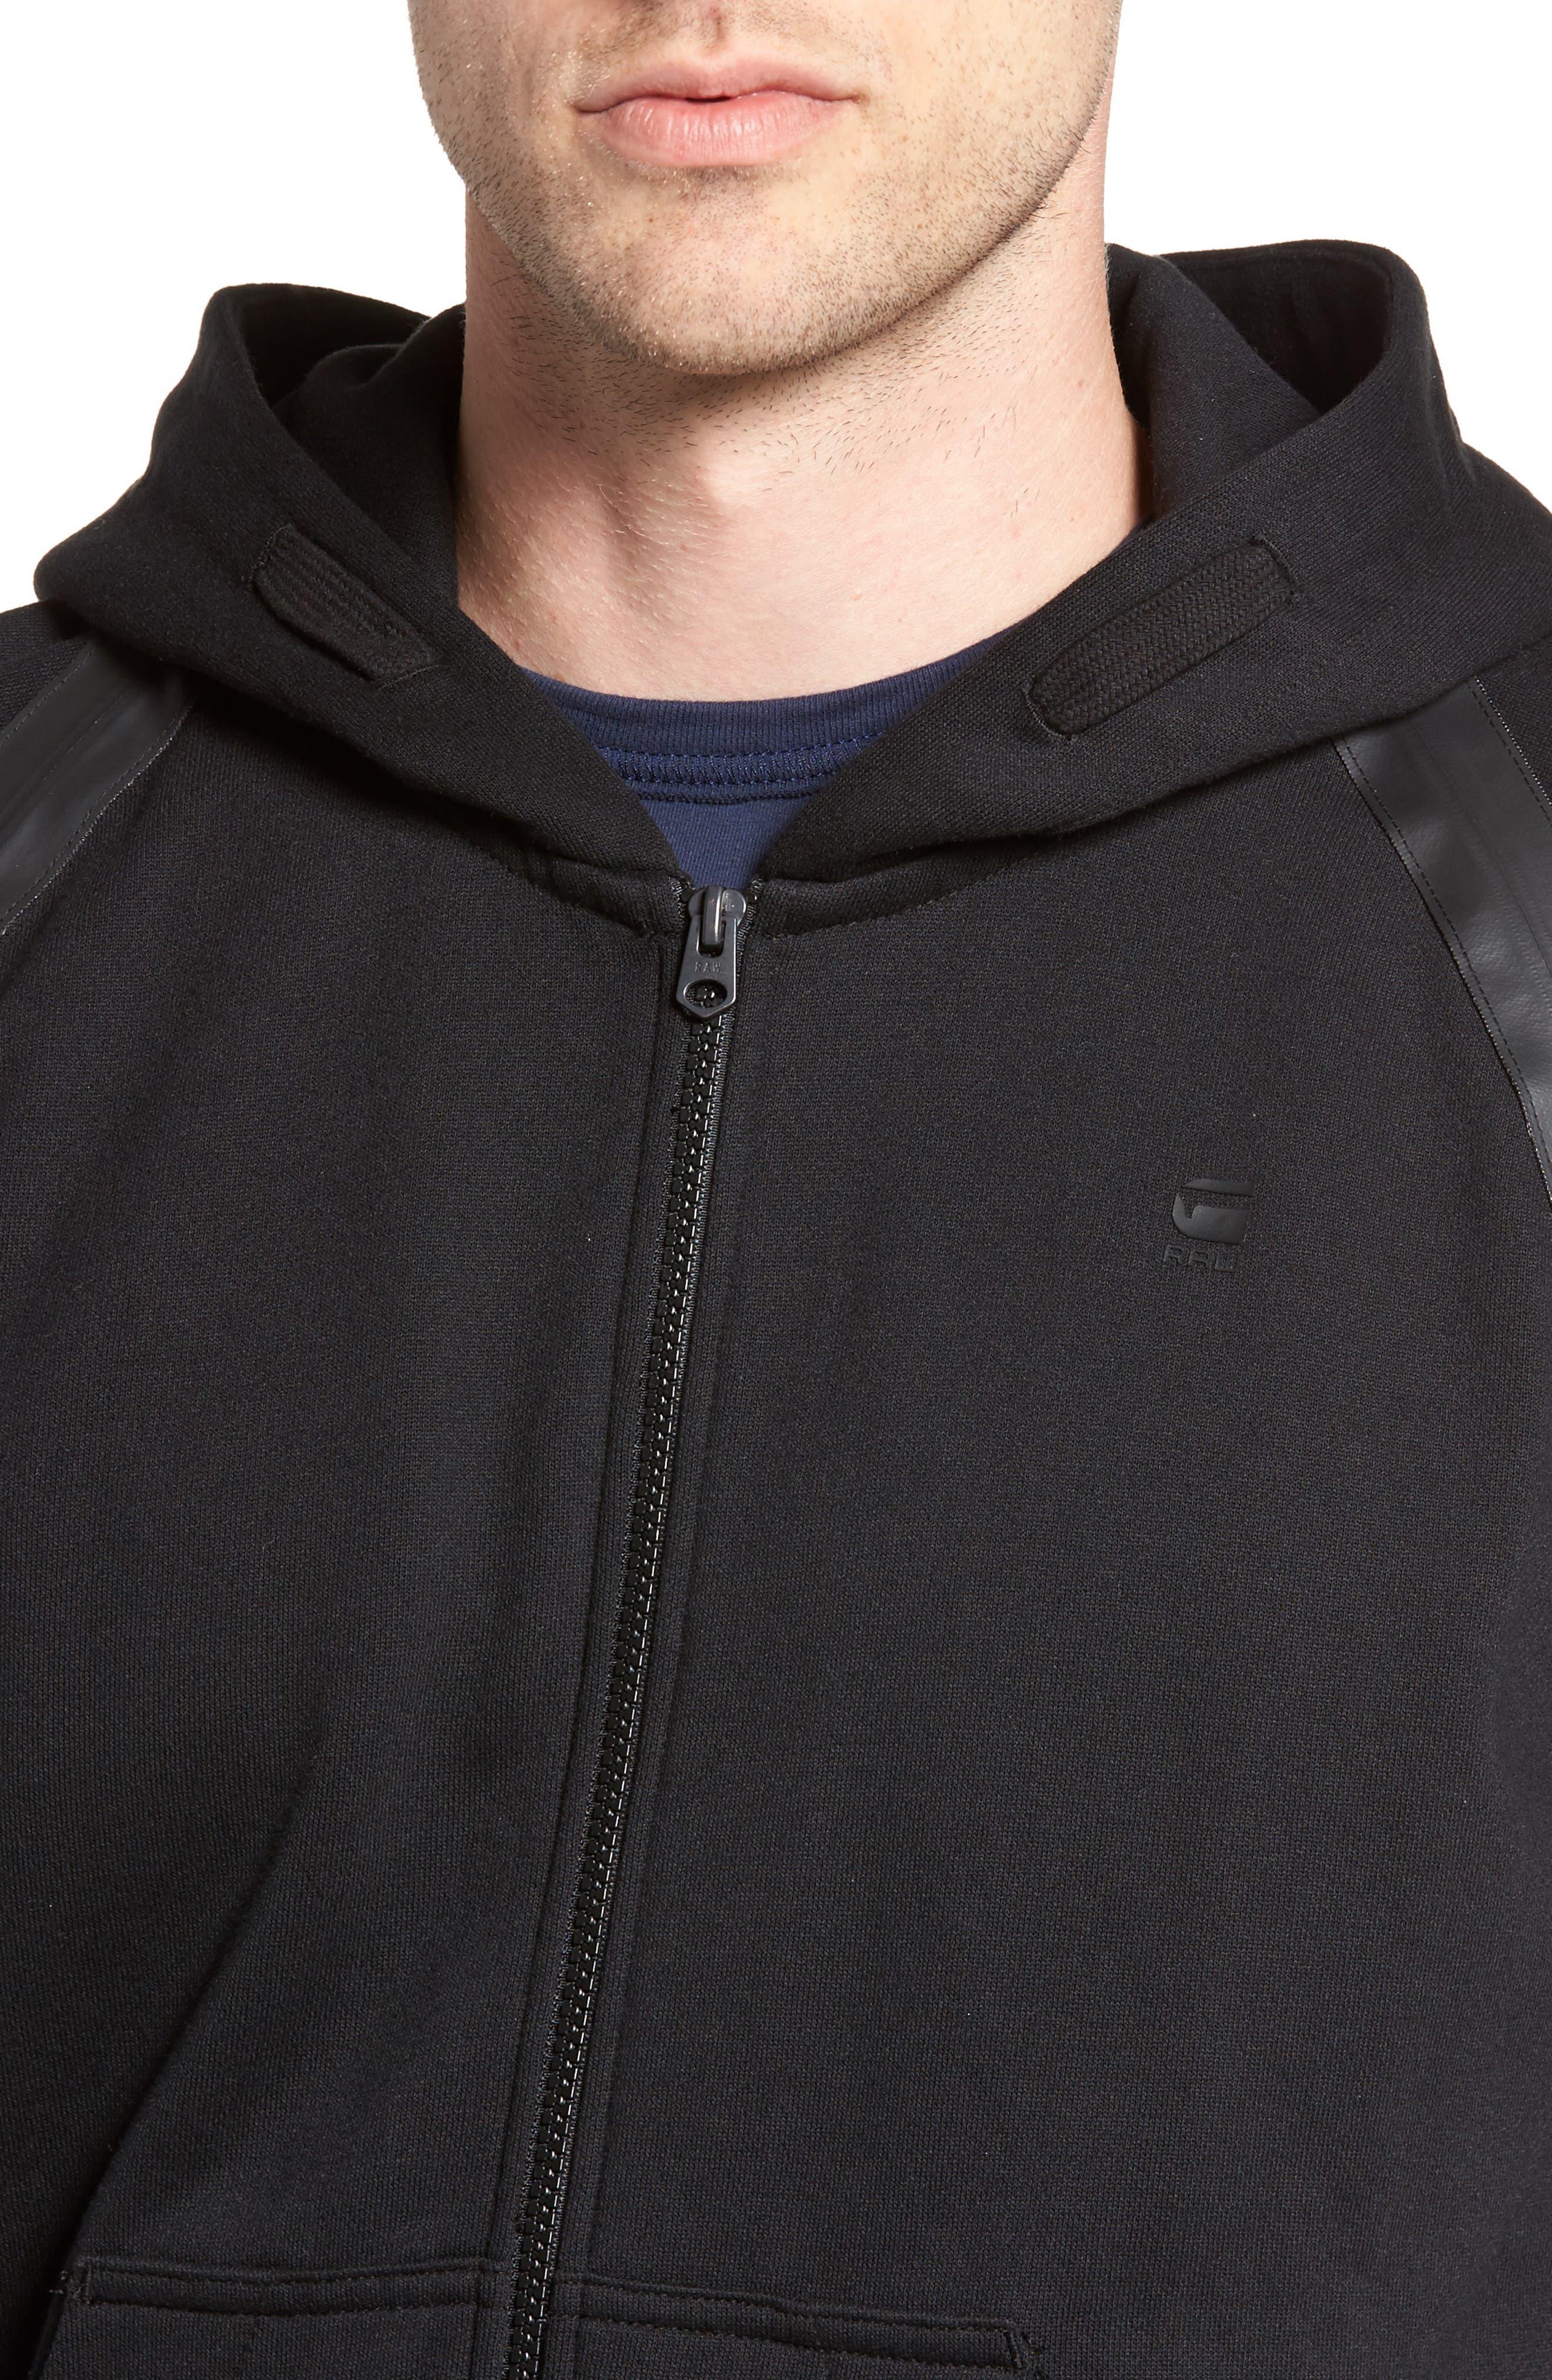 Alternate Image 4  - G-Star Raw Rackam Zip Hoodie with Faux Leather Trim